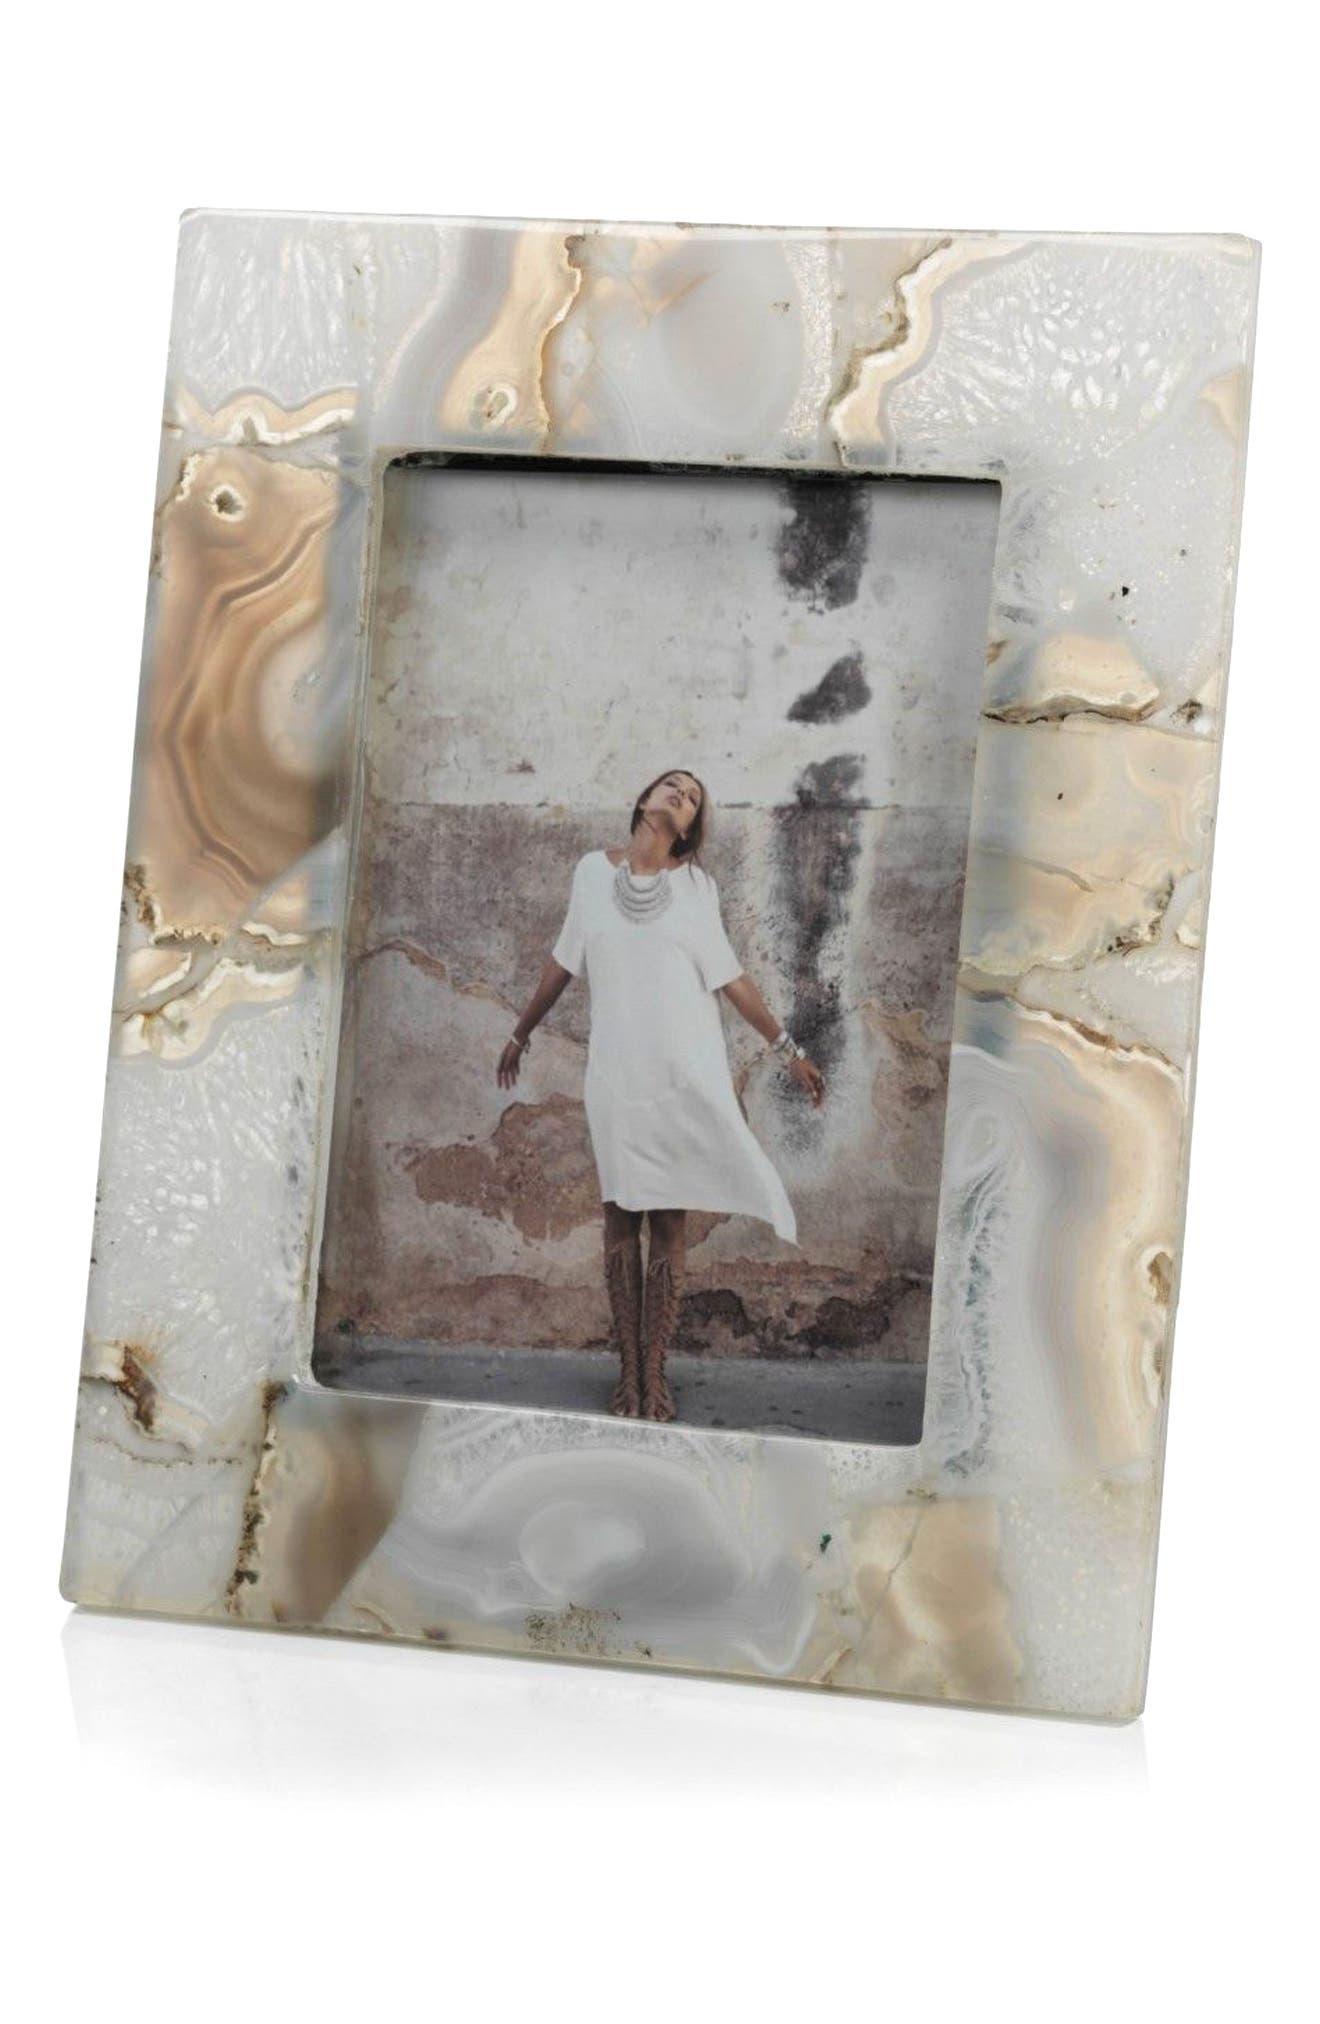 Preto Picture Frame,                             Main thumbnail 1, color,                             Grey/ White/ Off-White